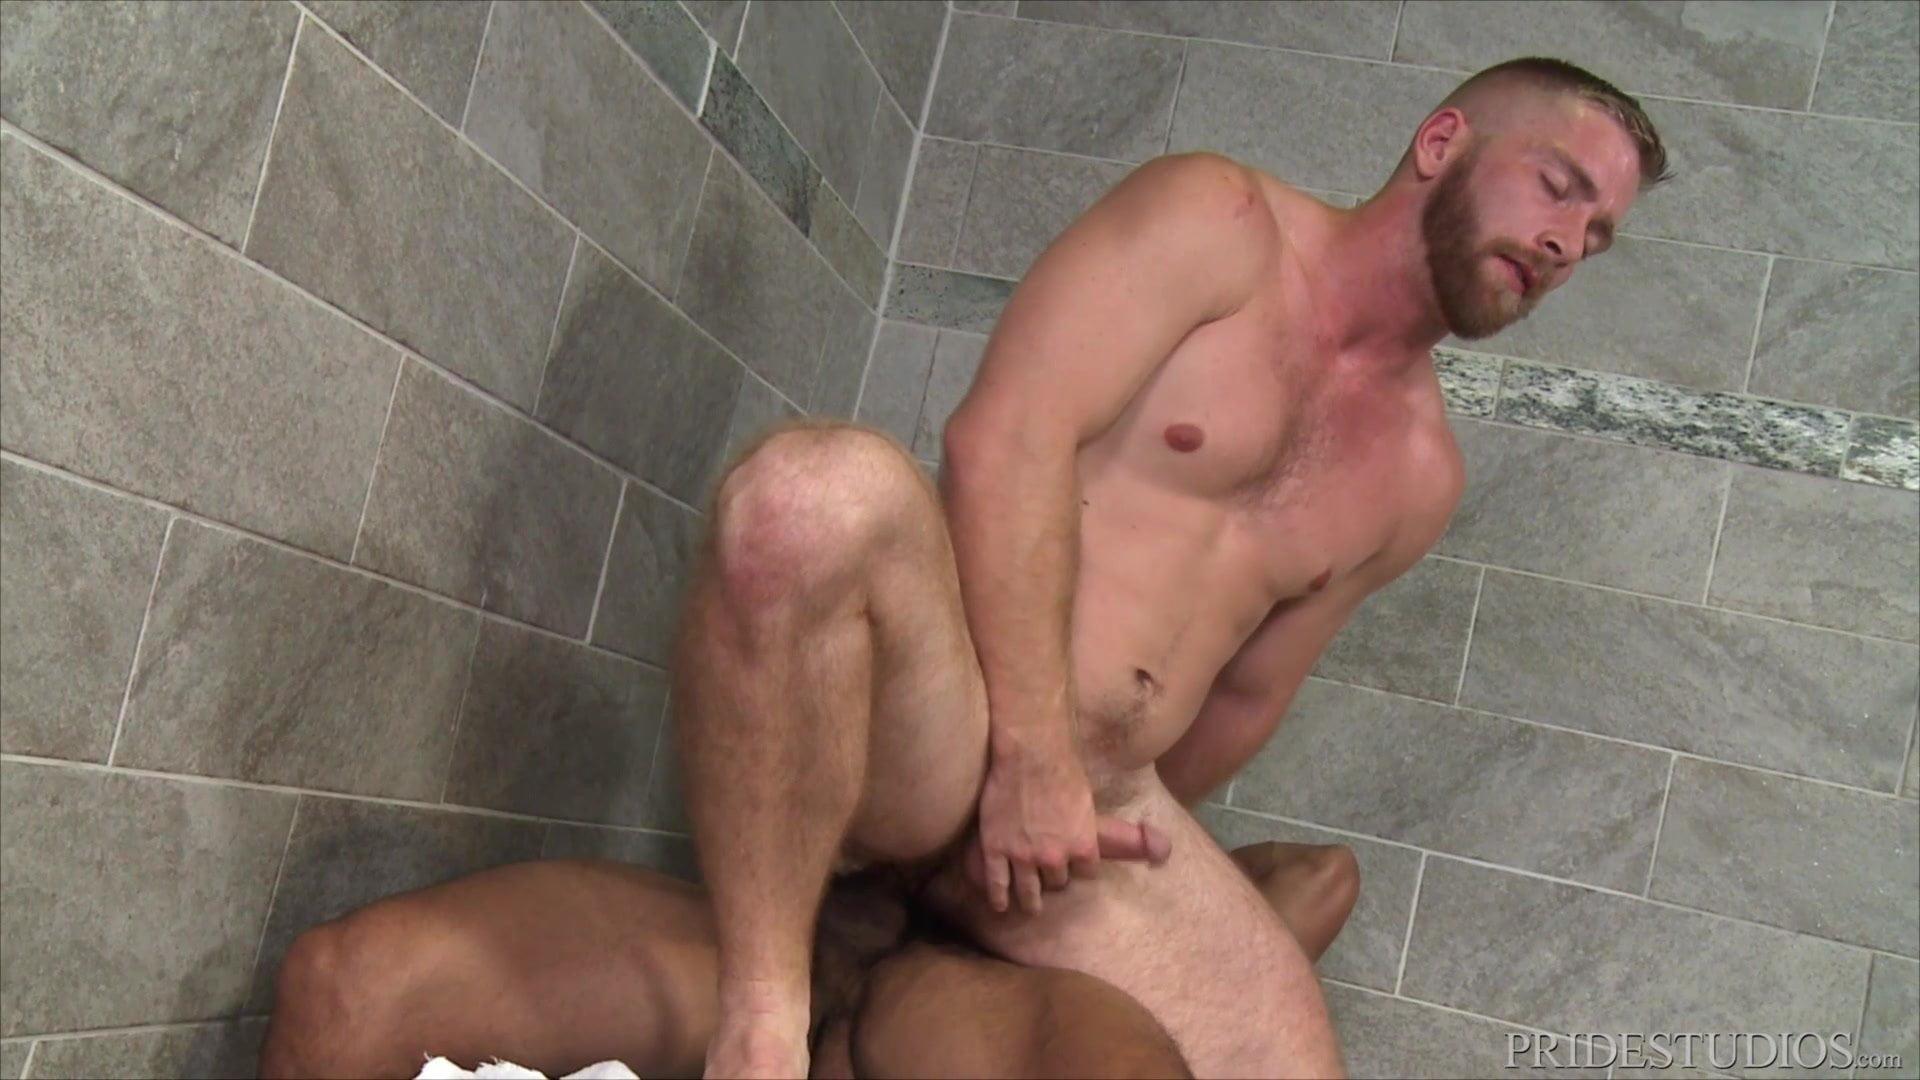 Gay male videos shower